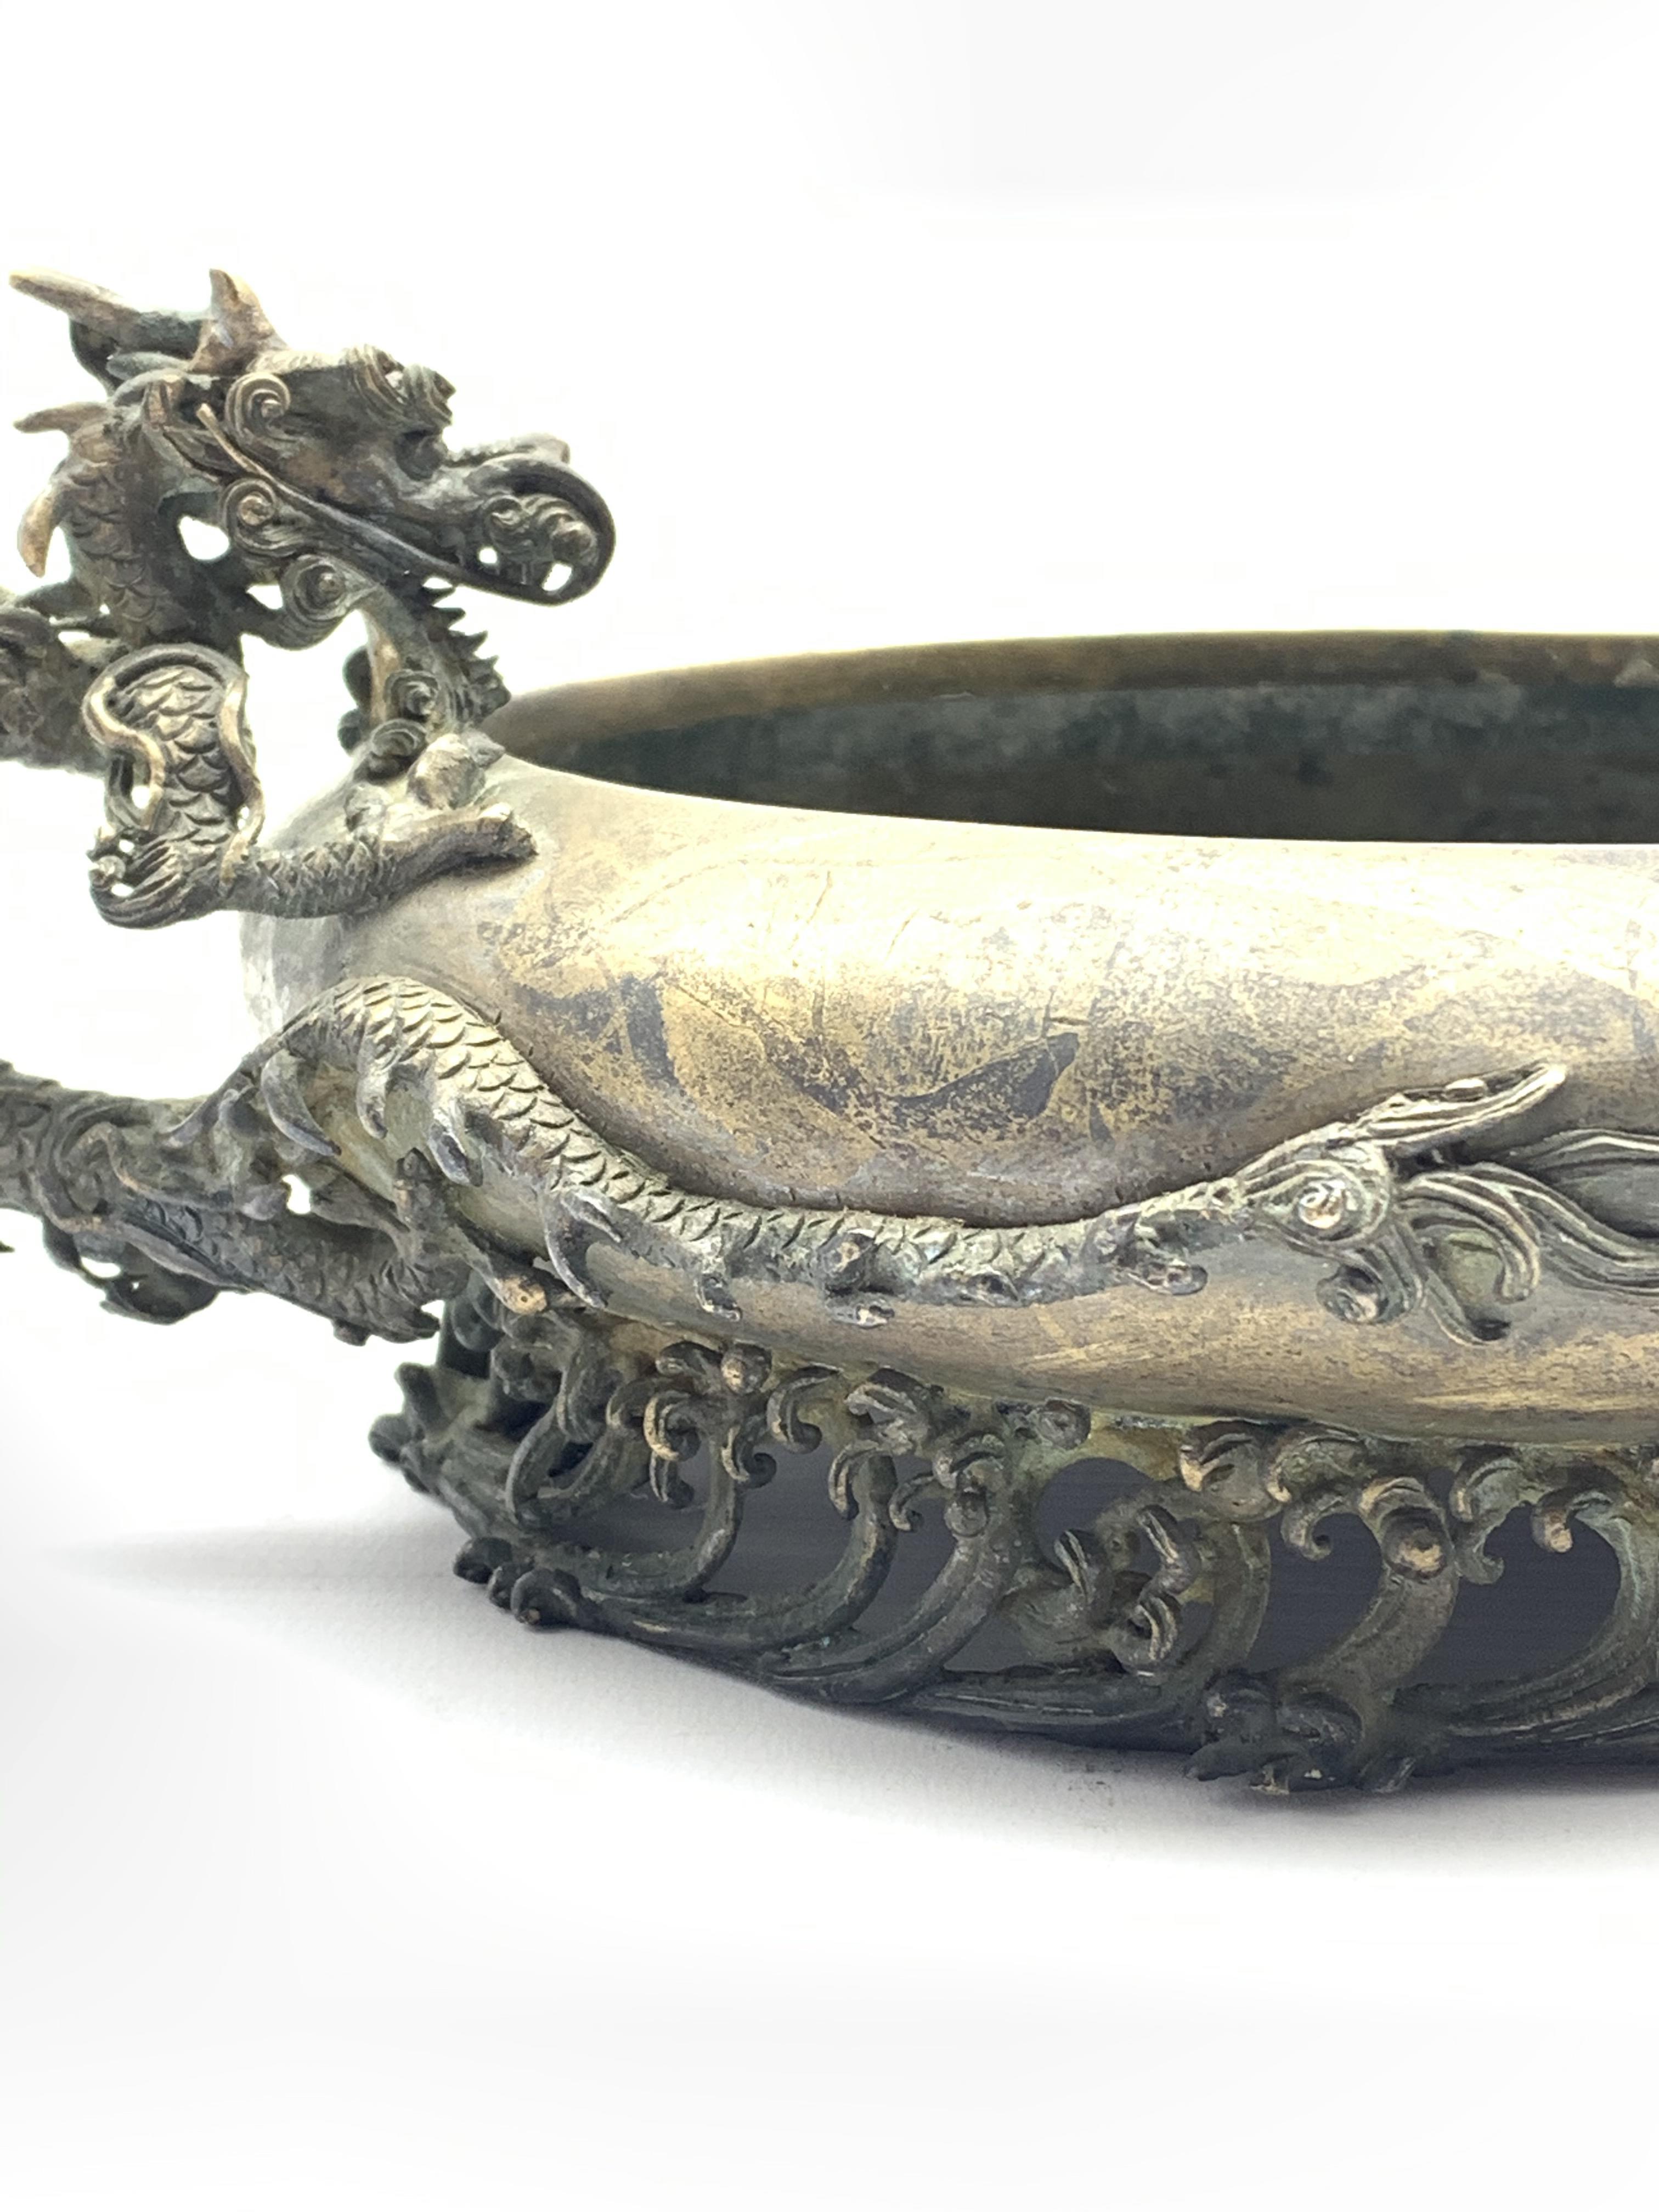 19th century Japanese bronze censer - Image 4 of 5